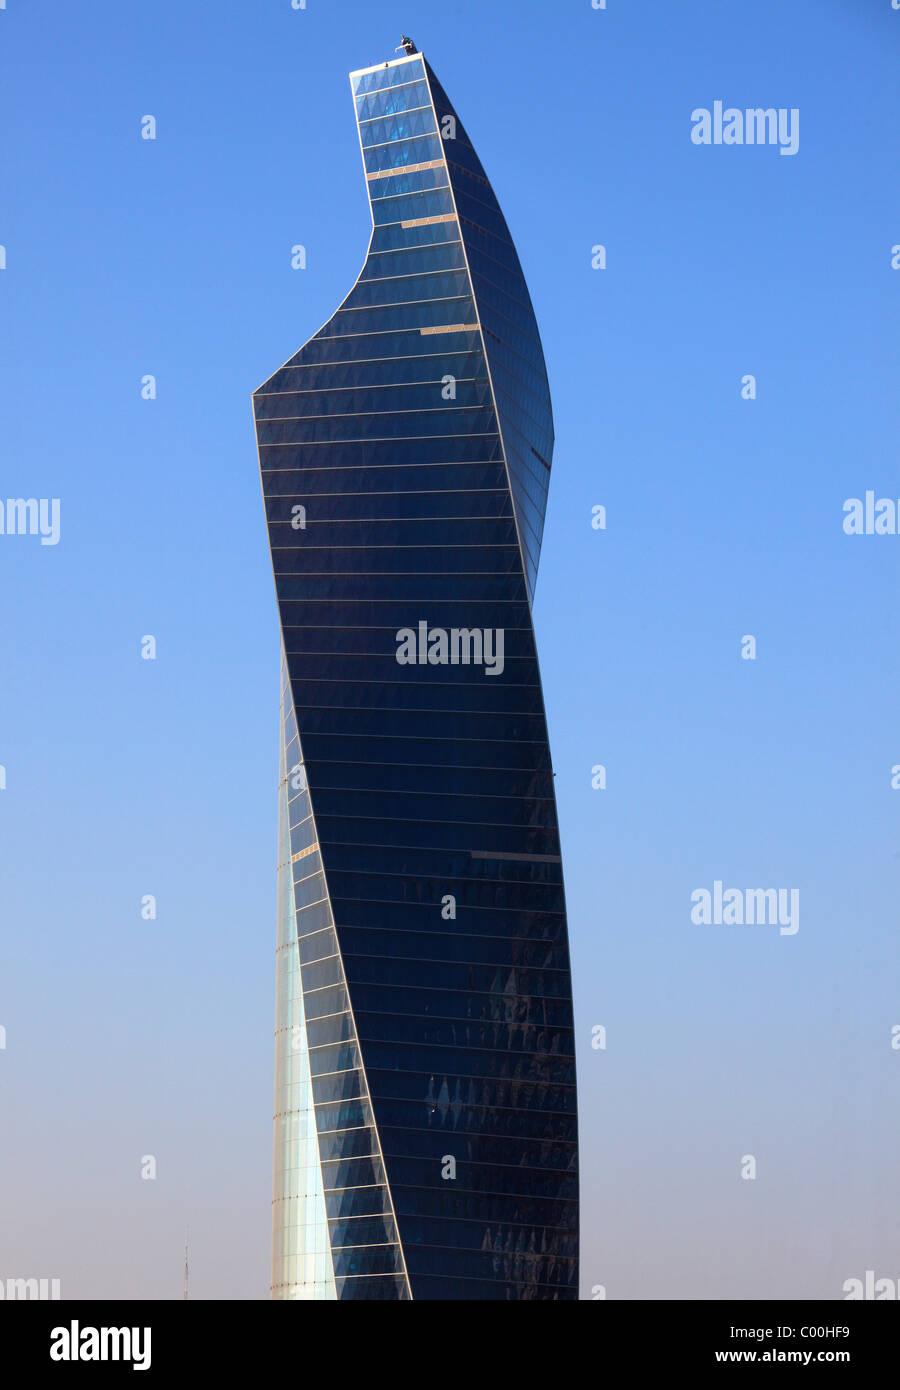 Kuwait, Kuwait City, skyscraper, highrise, building, - Stock Image